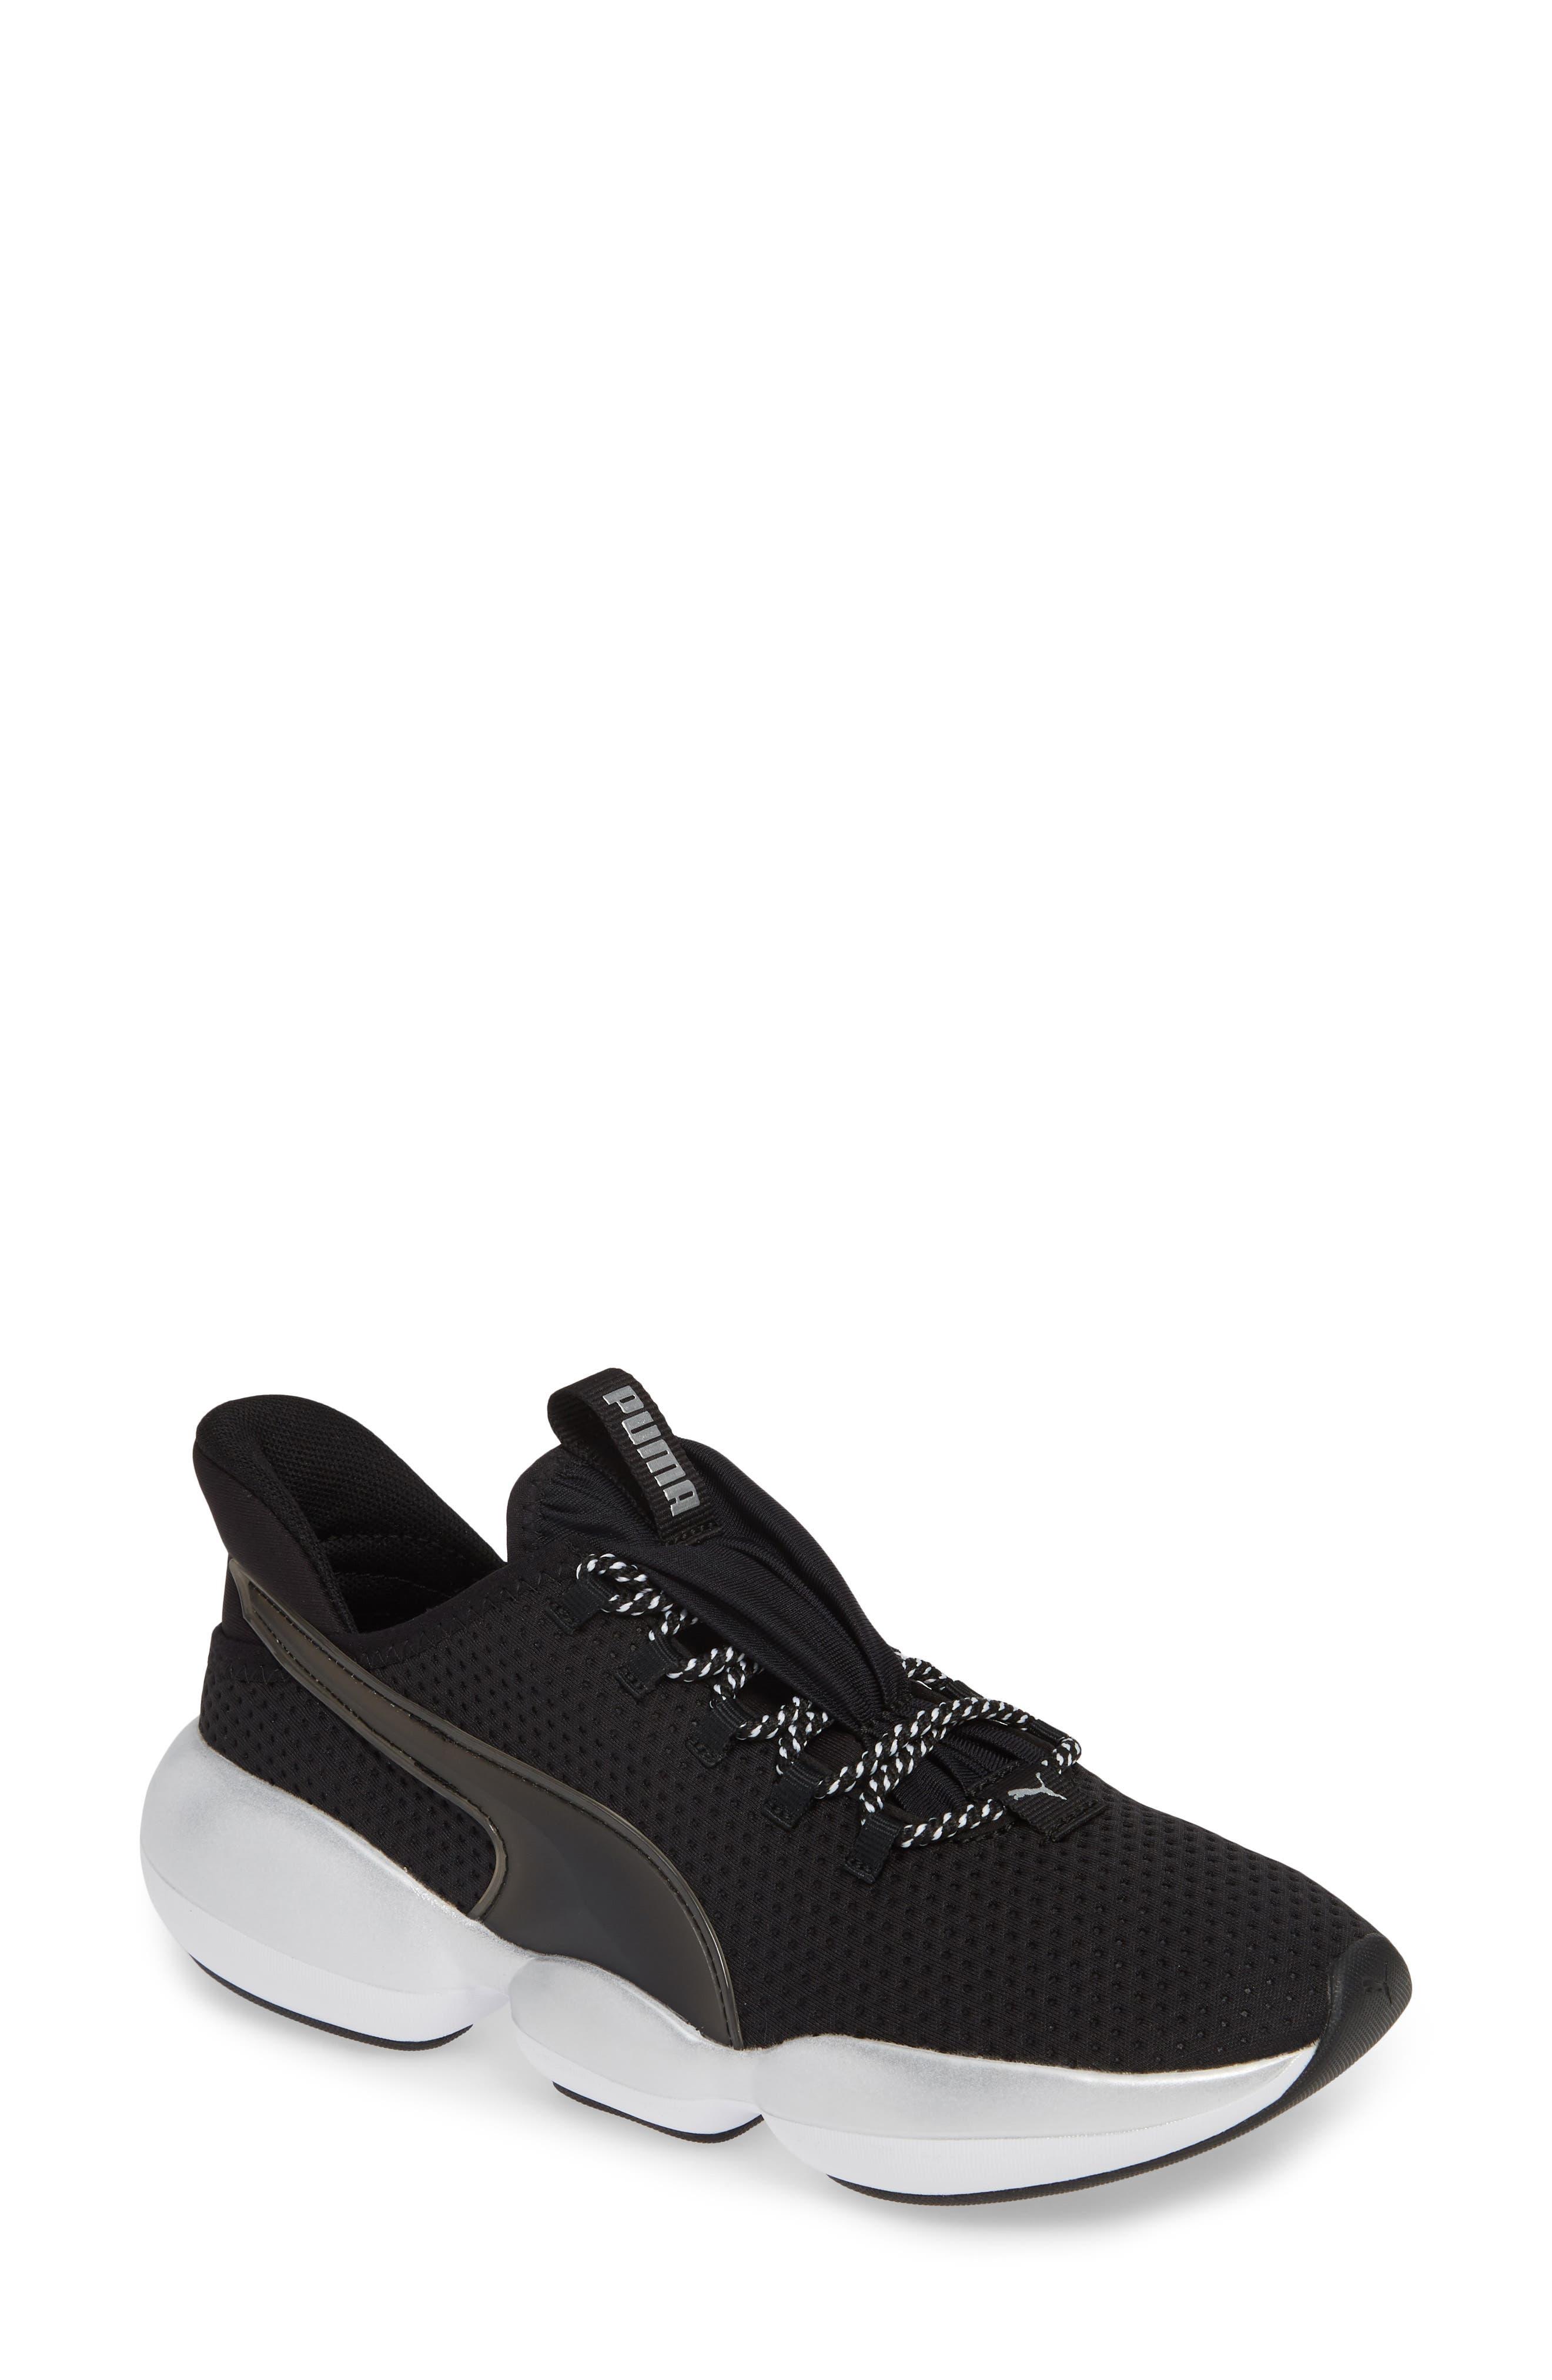 PUMA, Mode XT Hybrid Training Shoe, Main thumbnail 1, color, BLACK